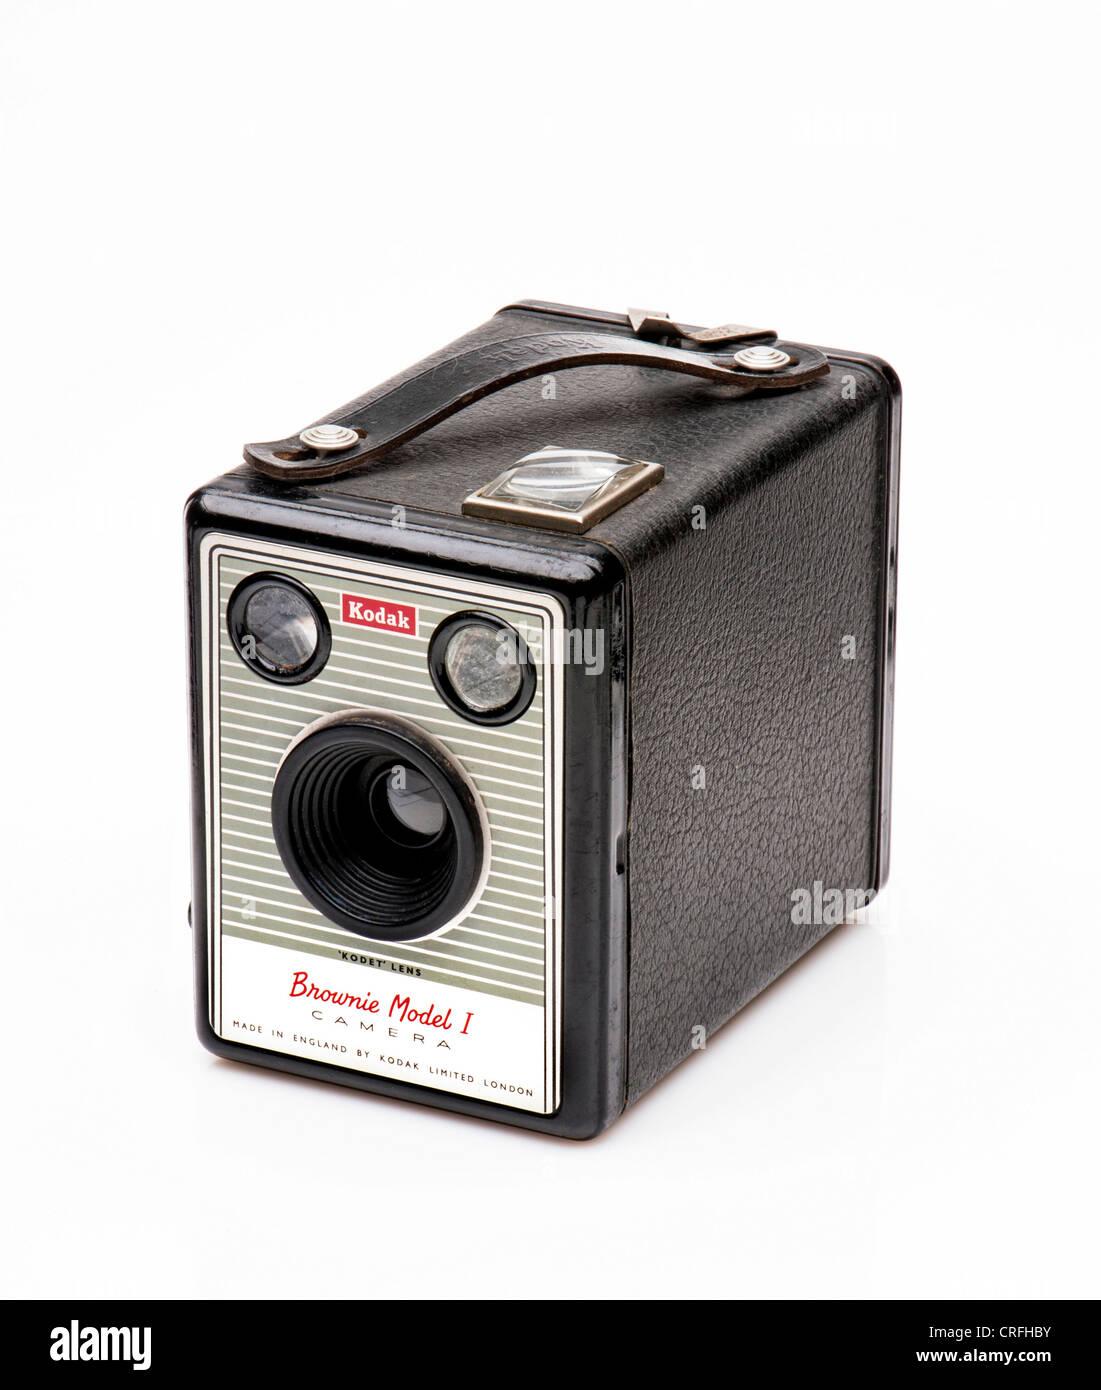 Kodak Box Brownie Model 1 vintage camera - Stock Image